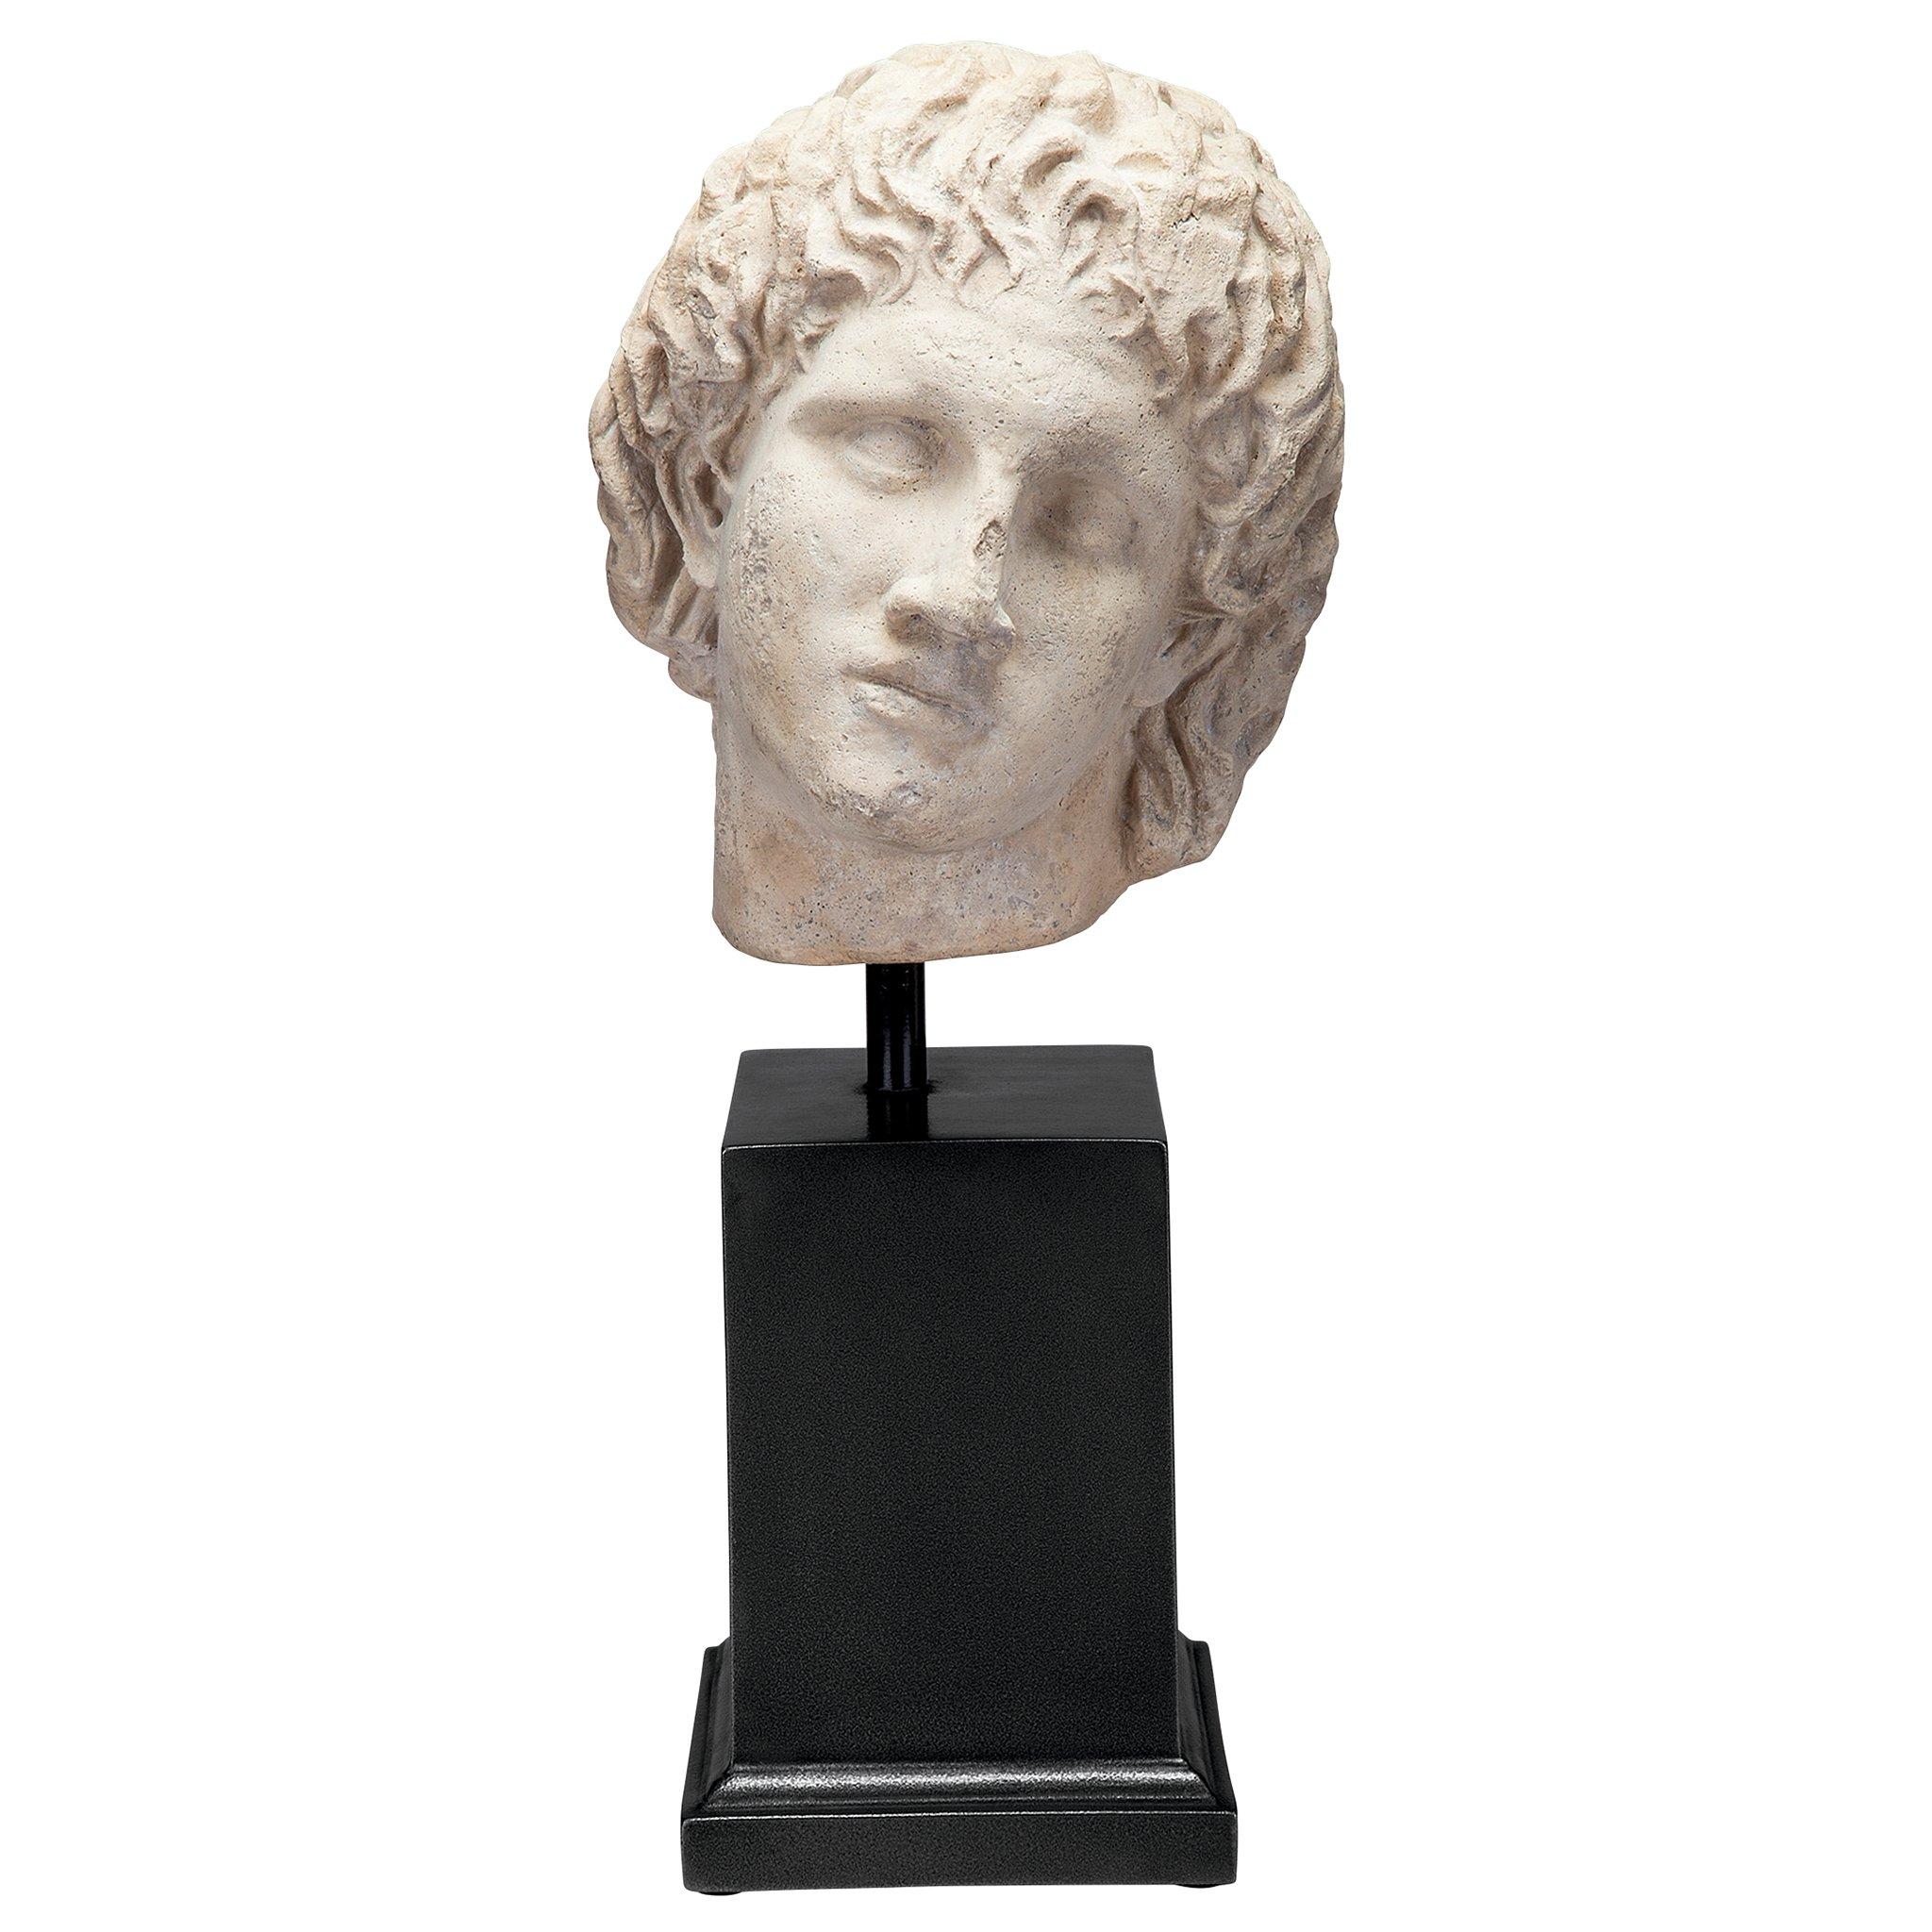 Design Toscano Alexander The Museum Mount Sculptural Bust, Antique Stone by Design Toscano